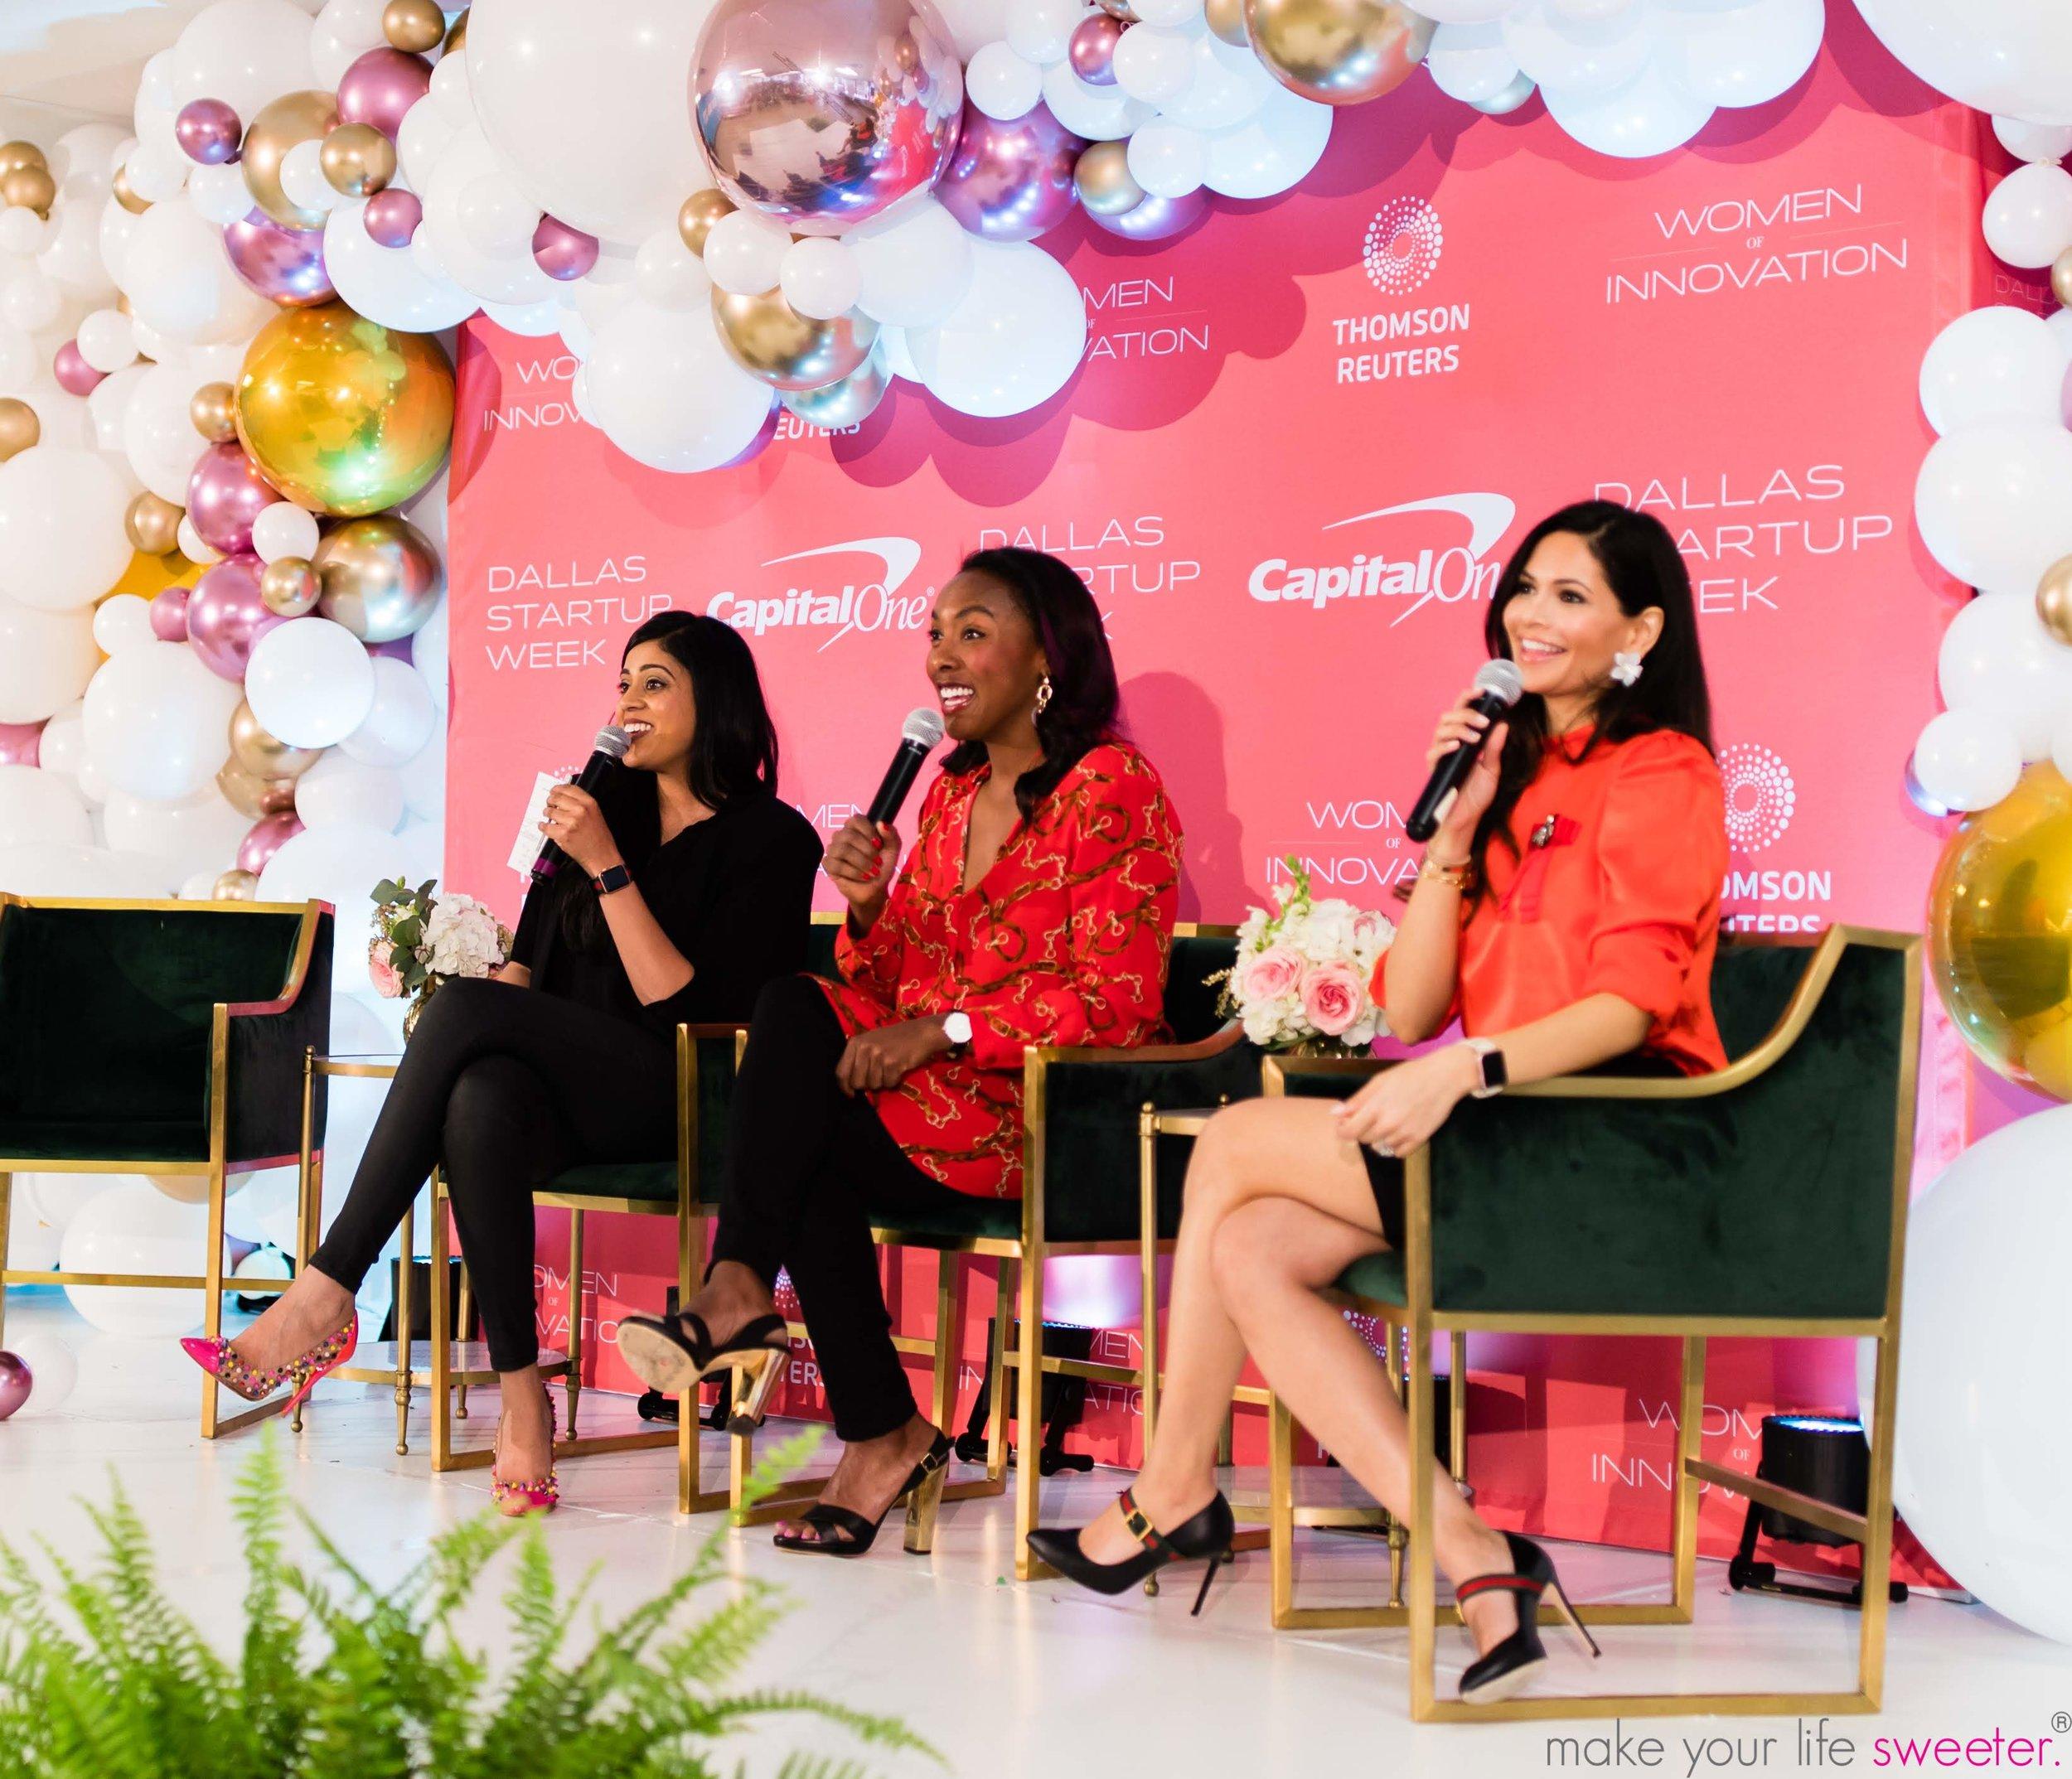 Yasmeen Tadia Speaking Engagements - DFW Startup Week - Women of Innovation